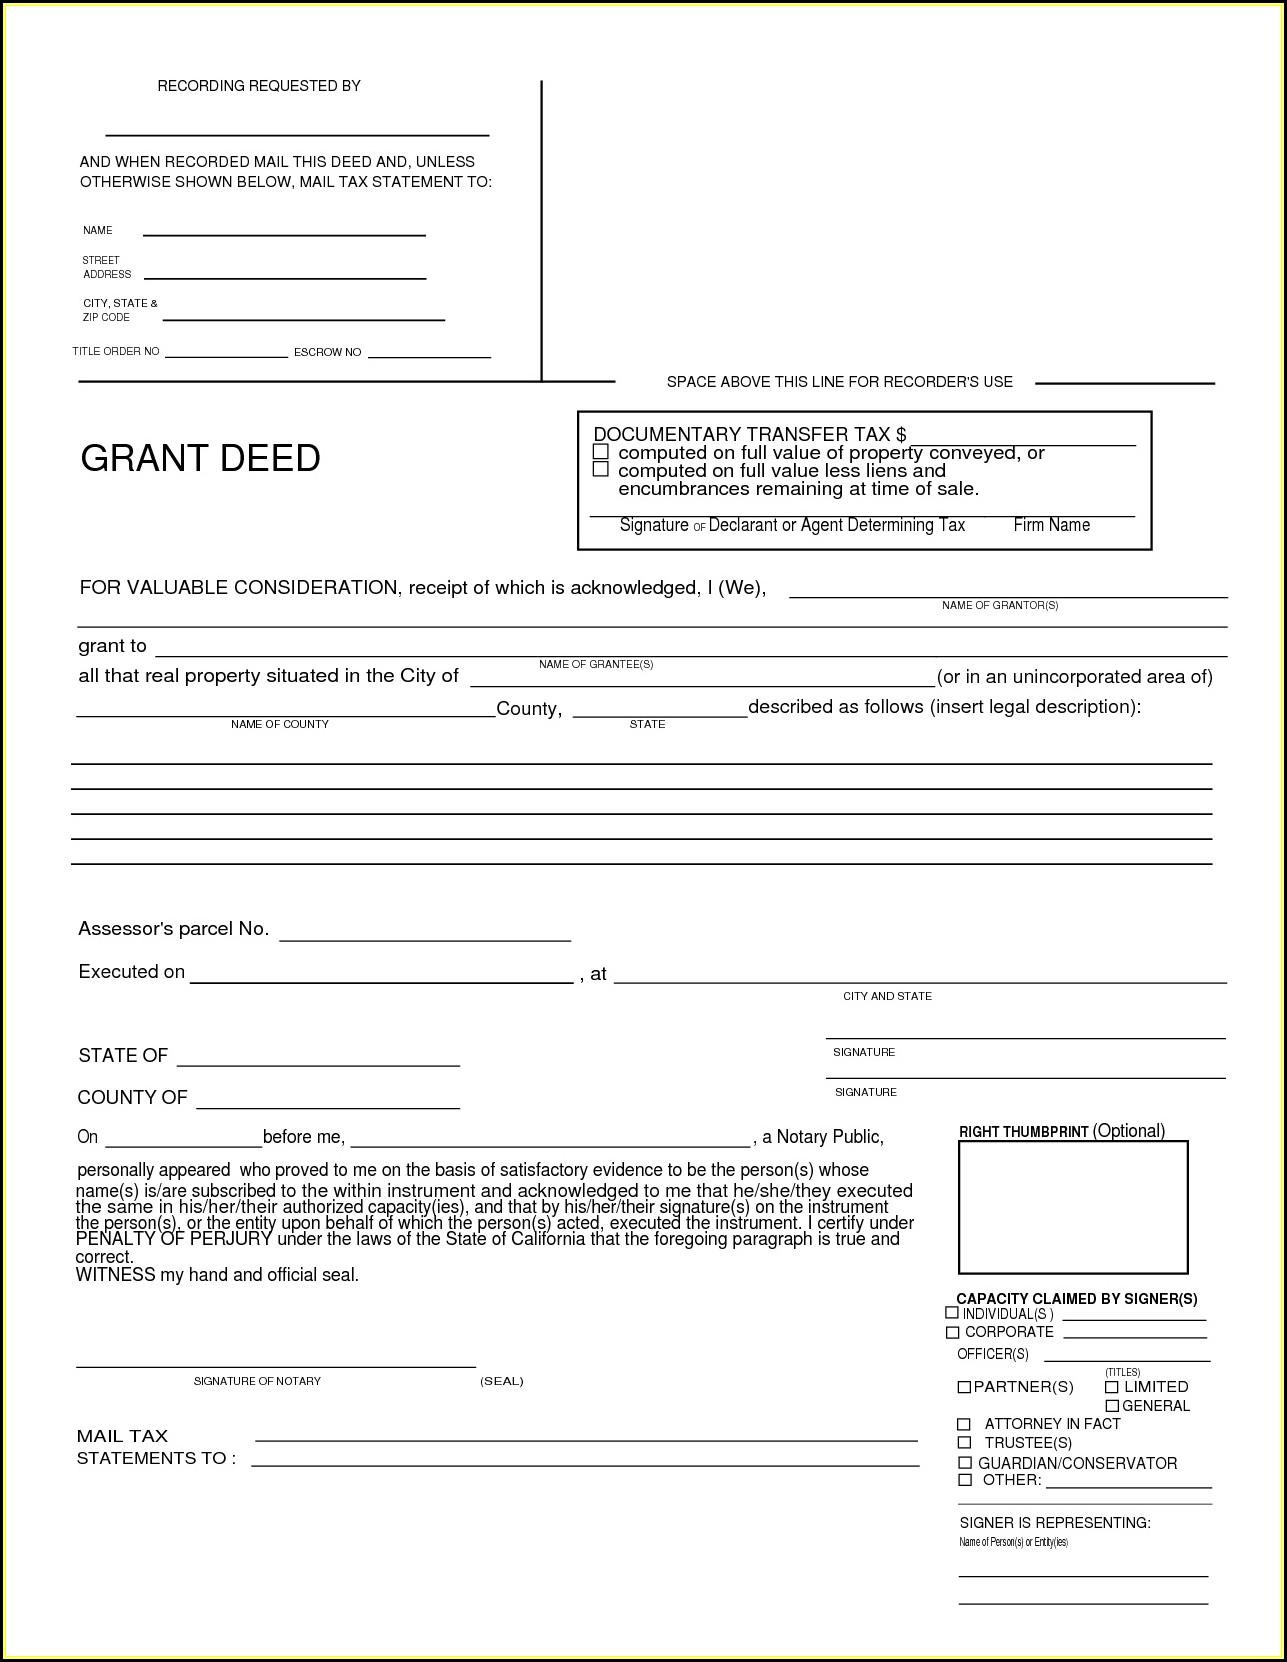 Grant Deed Form California Los Angeles County